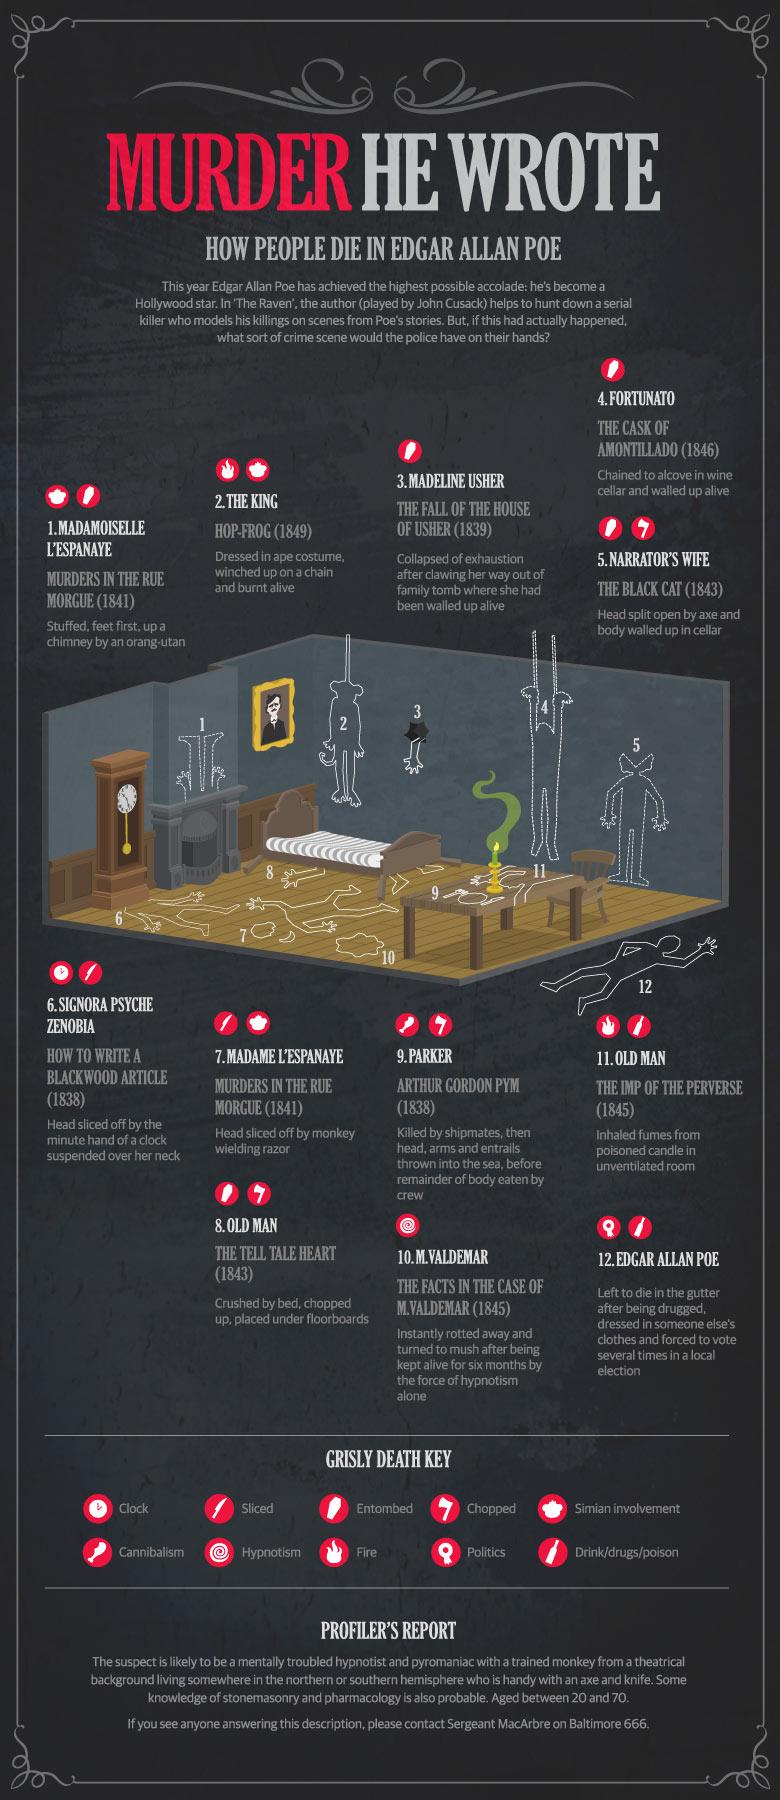 Murder He Wrote - Edgar Allan Poe death scenes infographic